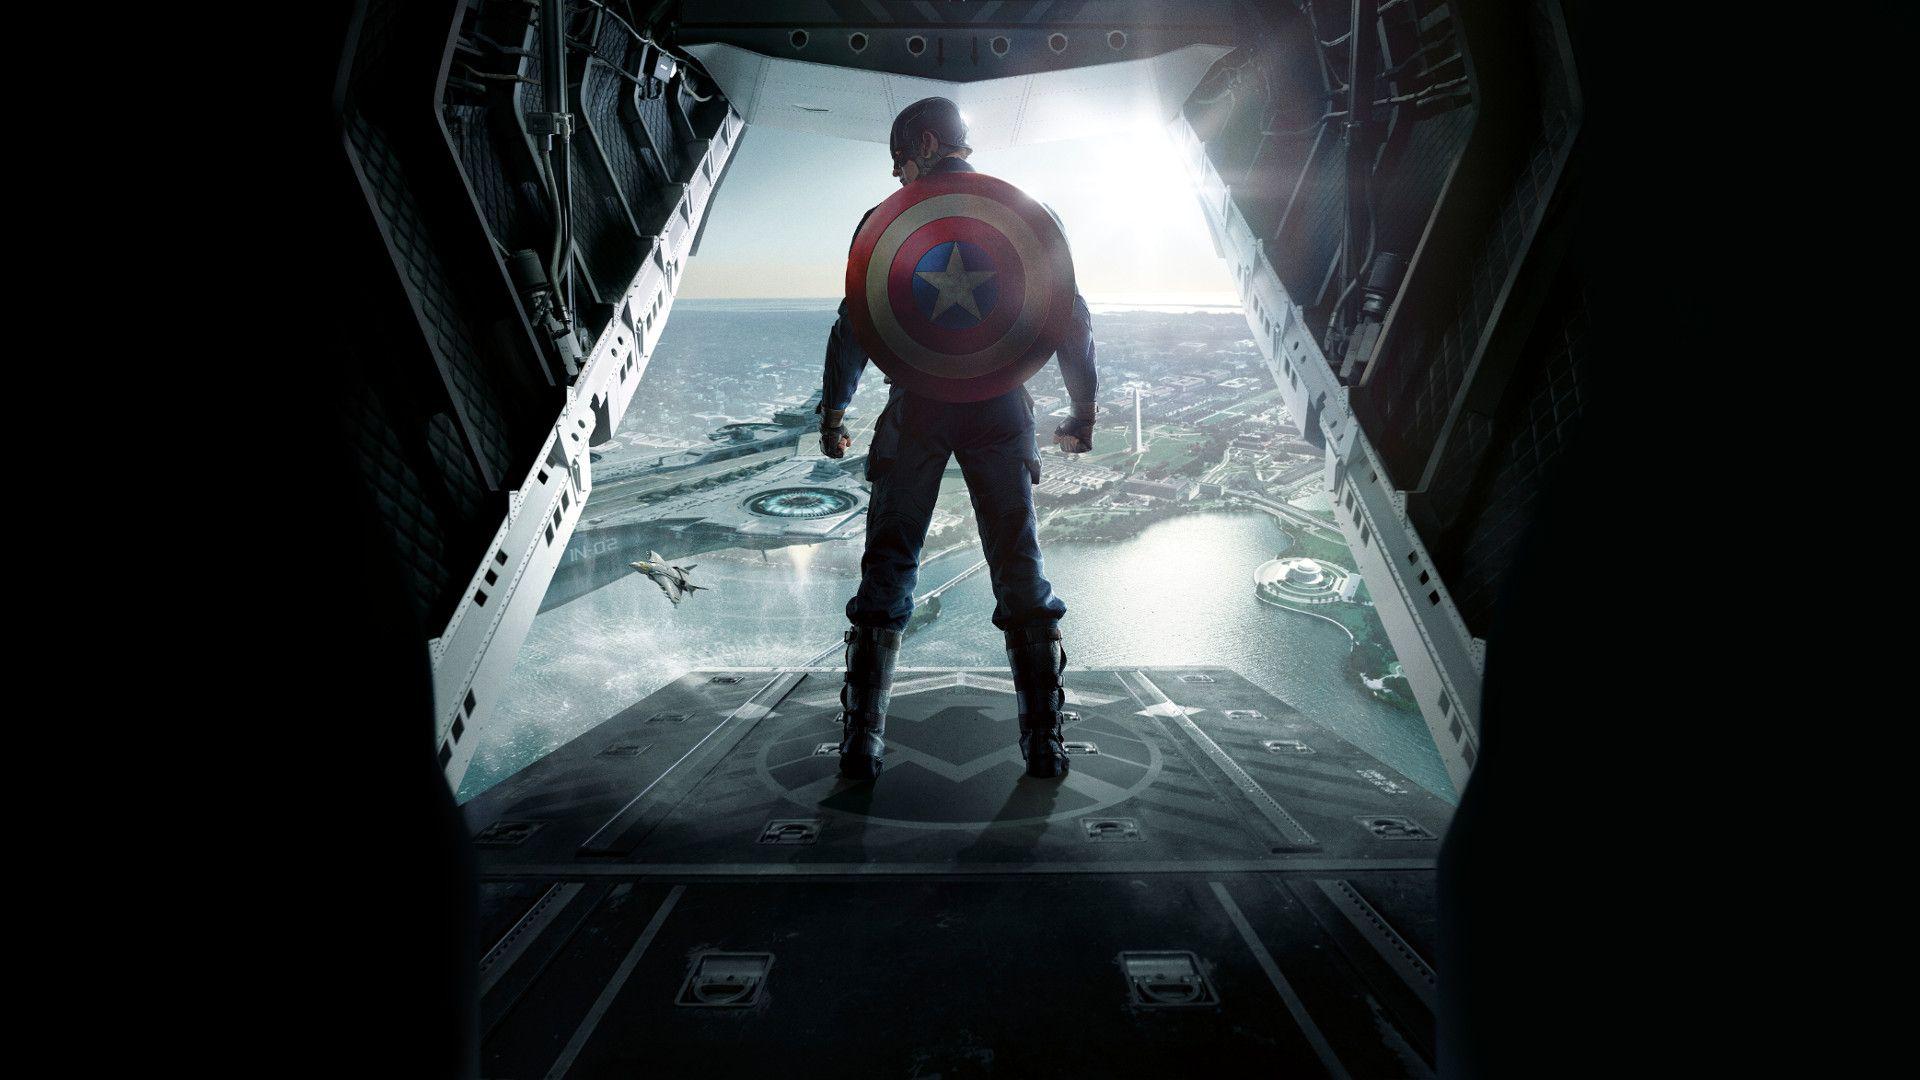 Movie Captain America The Winter Soldier Wallpaper